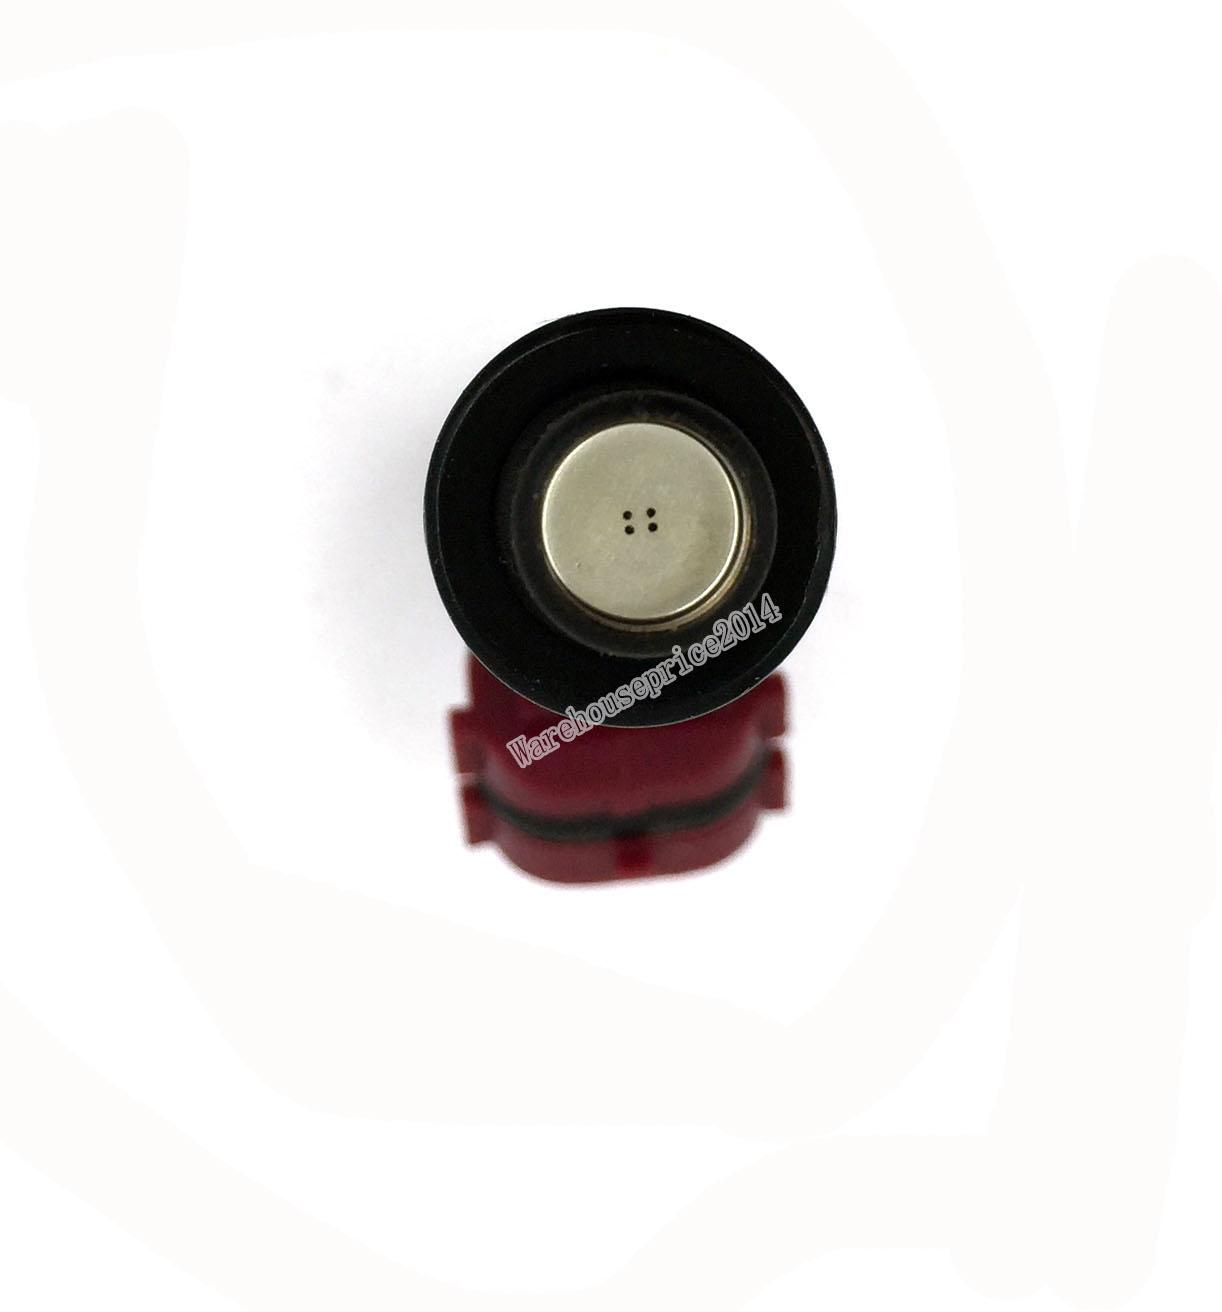 New Fuel Injector BP4W13250 For Mazda Miata 1999-2000 1.8L 1.8 BP4W-13-250